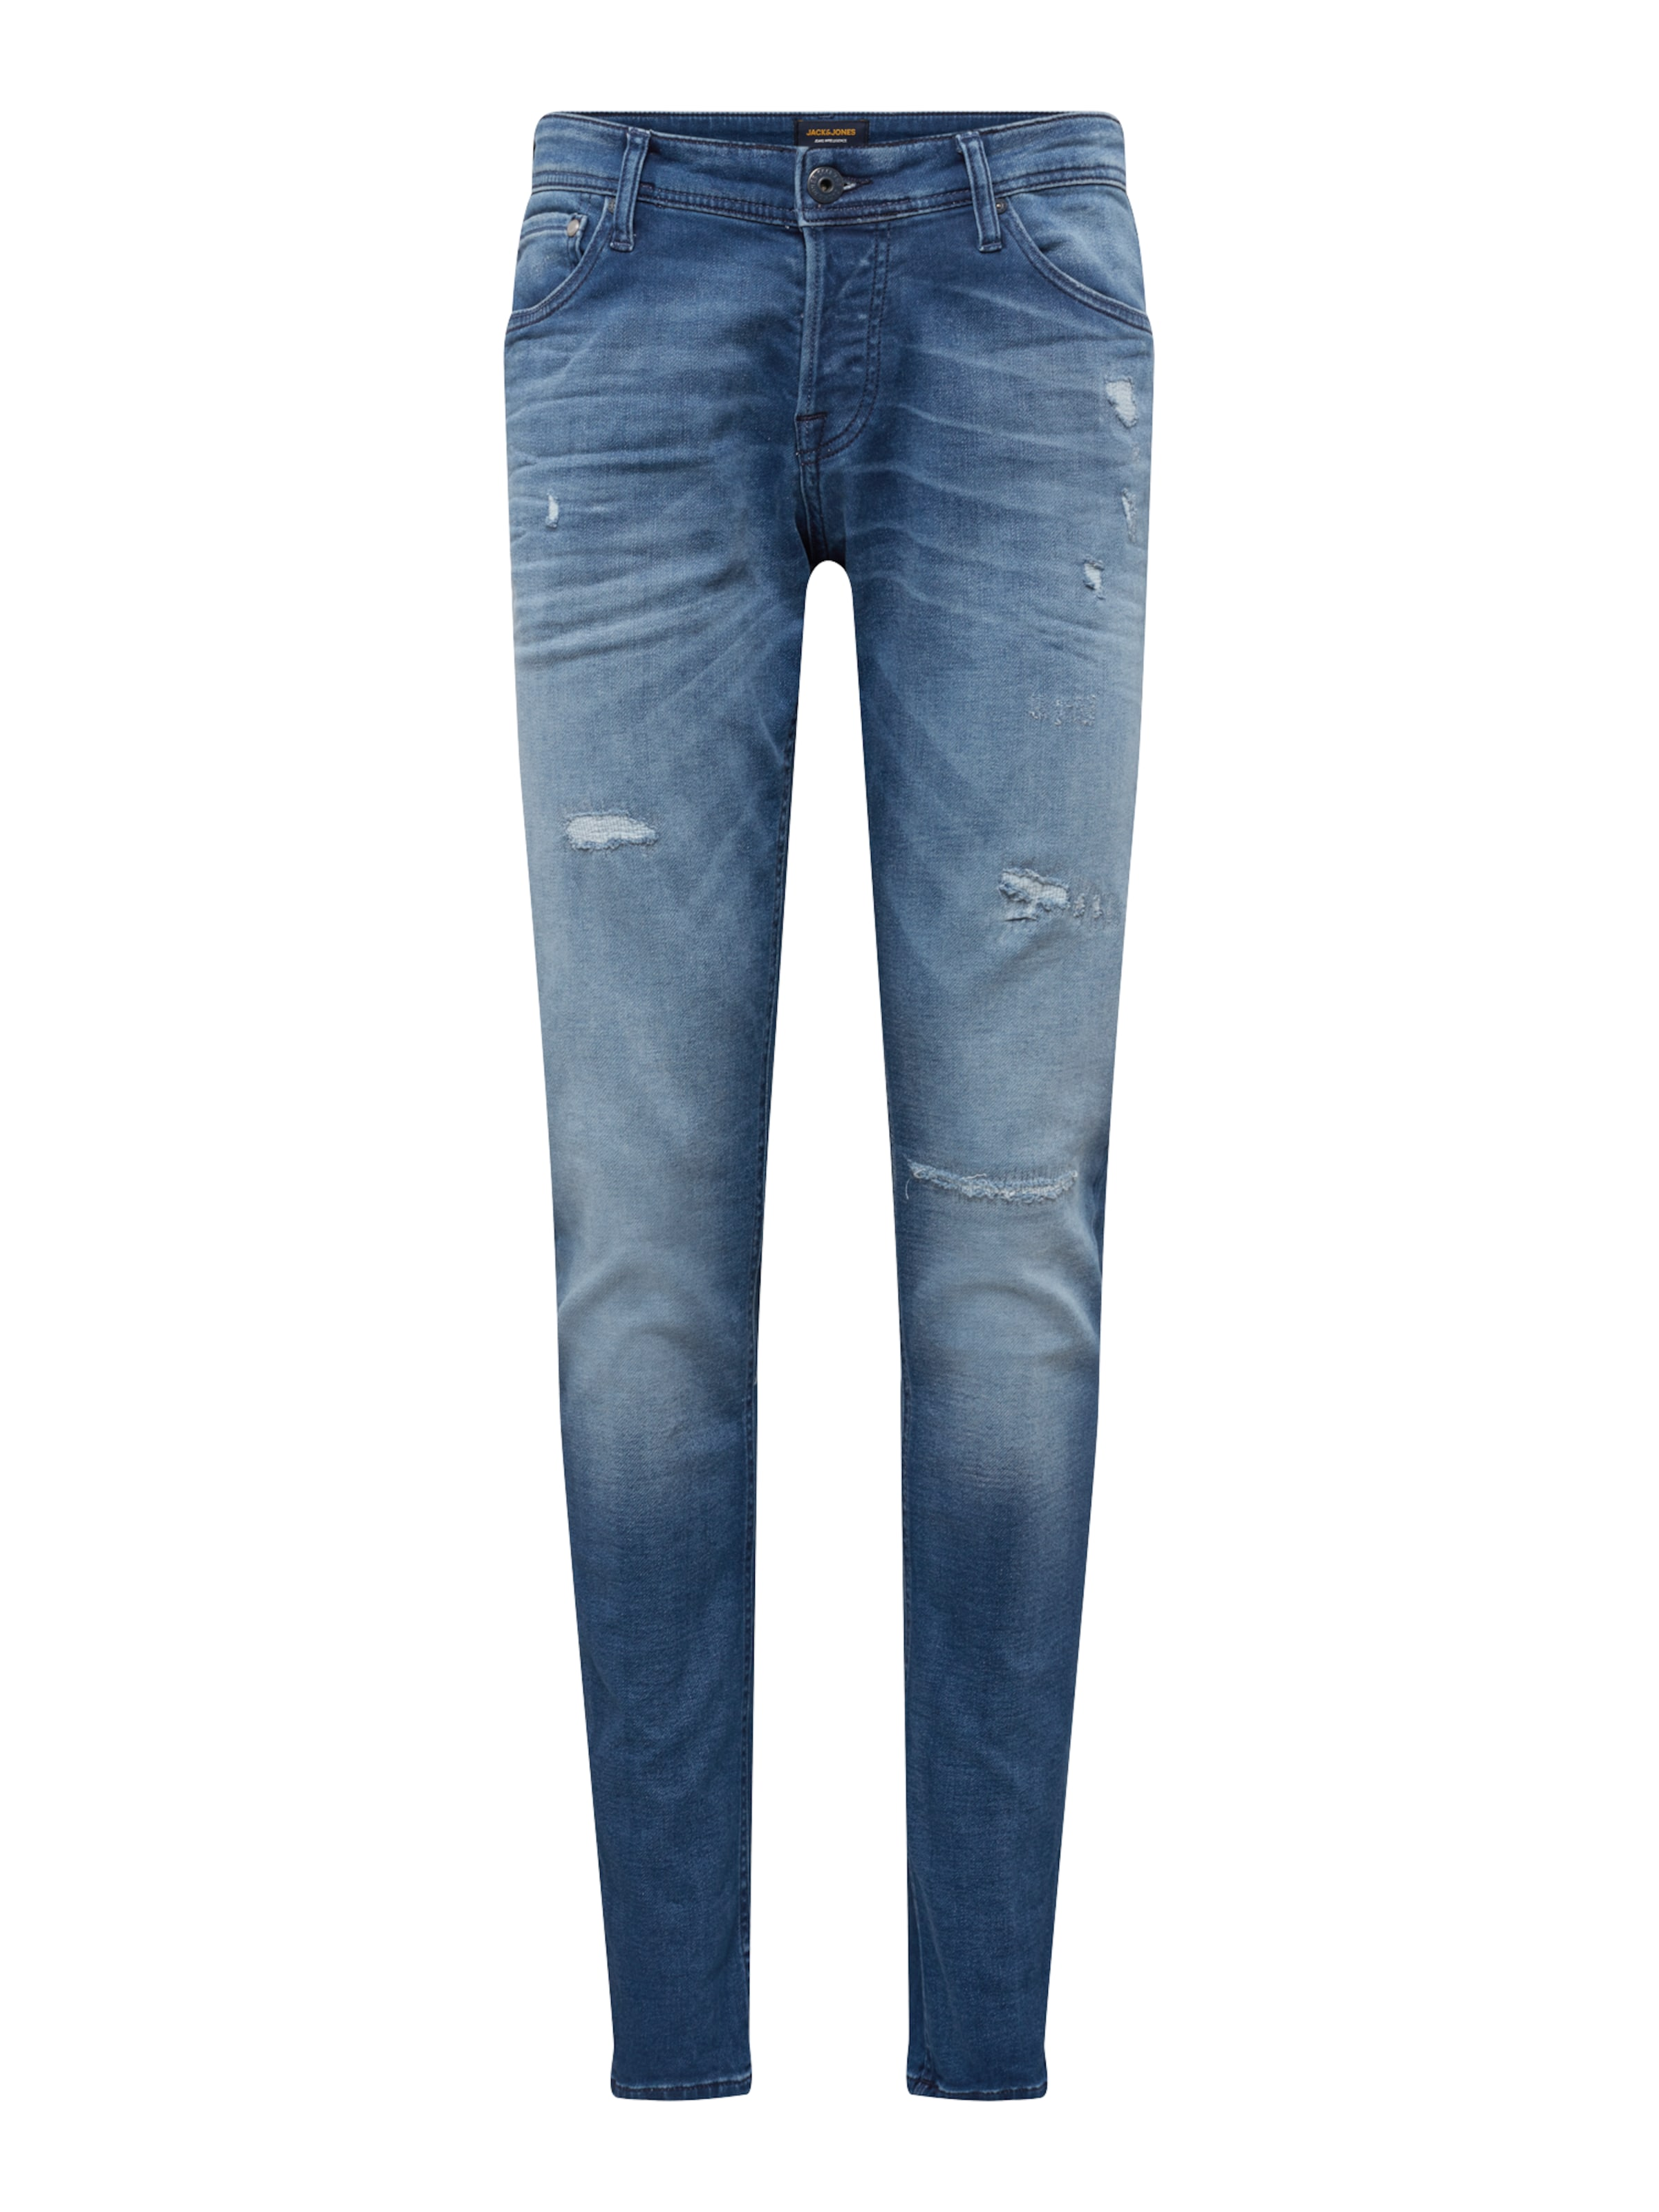 Jackamp; Denim In Jeans Jones Blue 'glenn' 0Nn8yvOmw